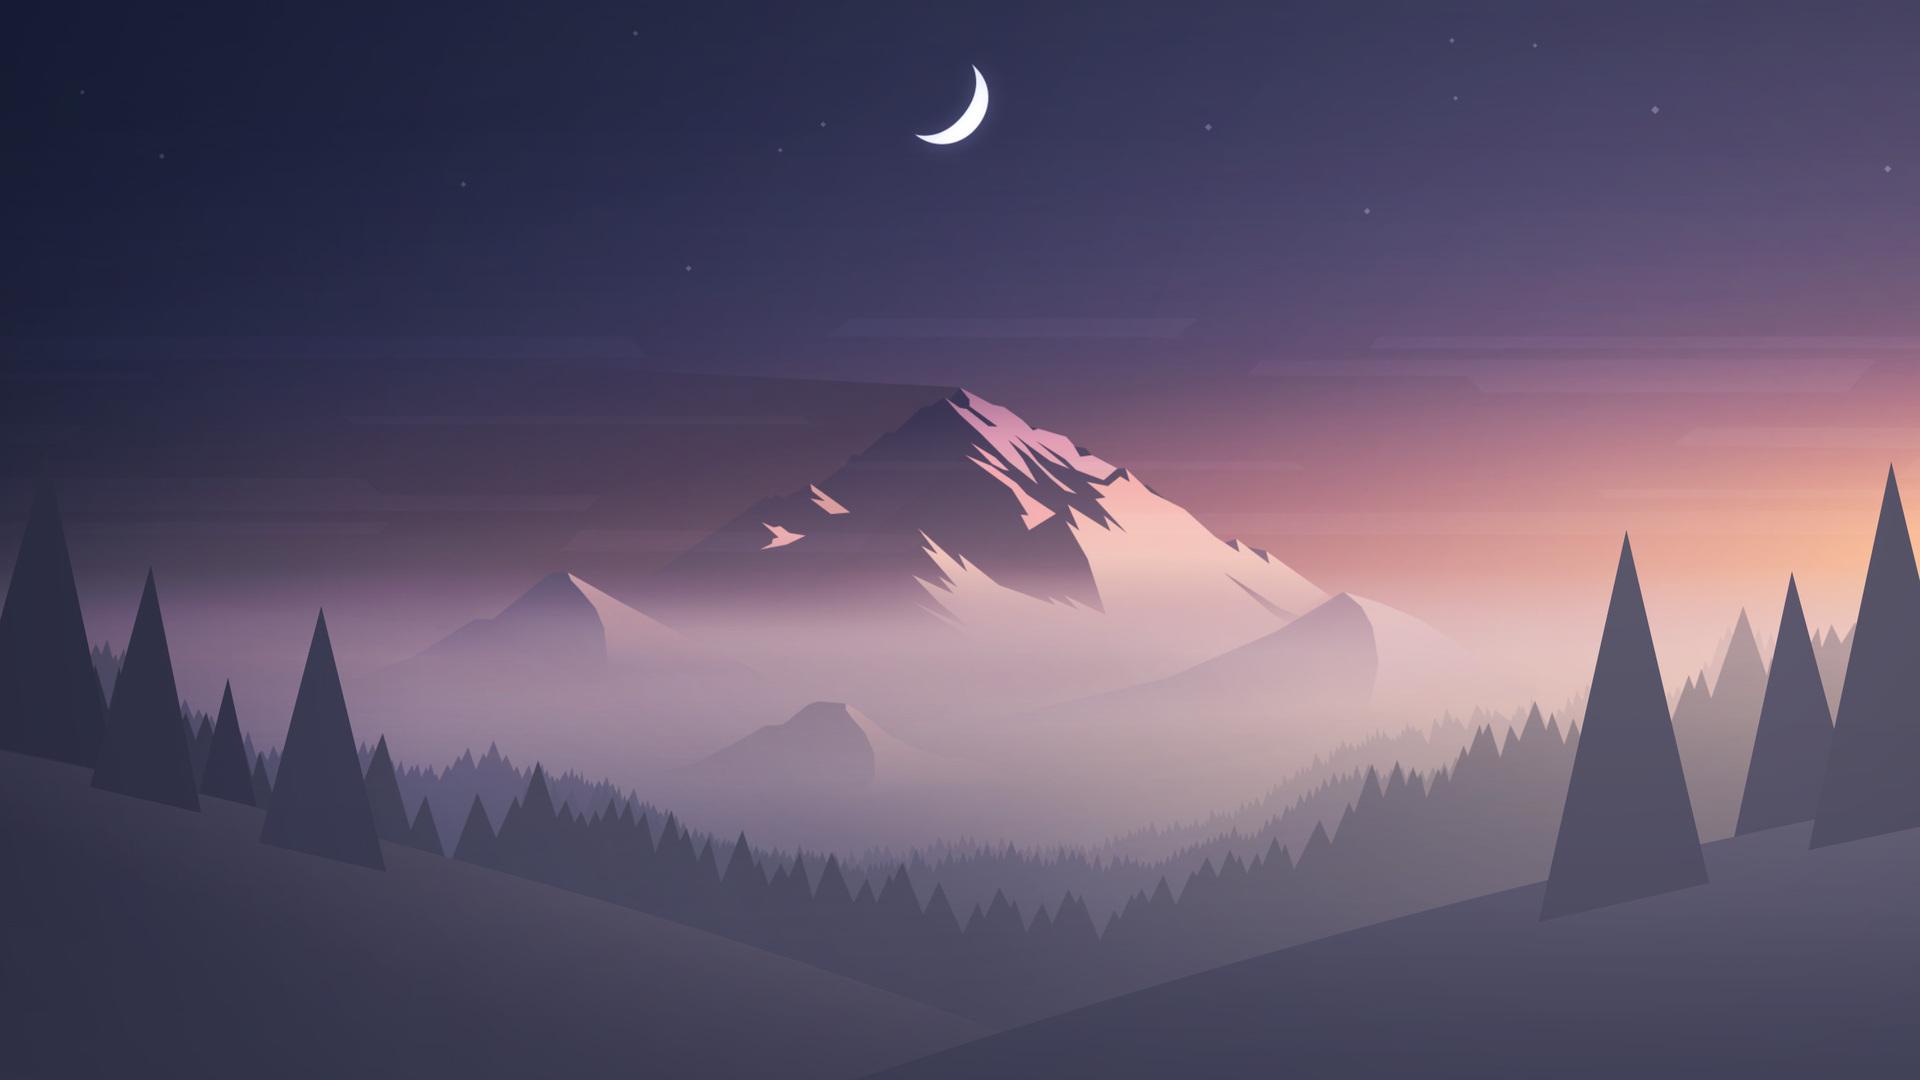 Minimalism Mountain Peak Full Hd Wallpaper: 1920x1080 Mountains Moon Trees Minimalism Laptop Full HD